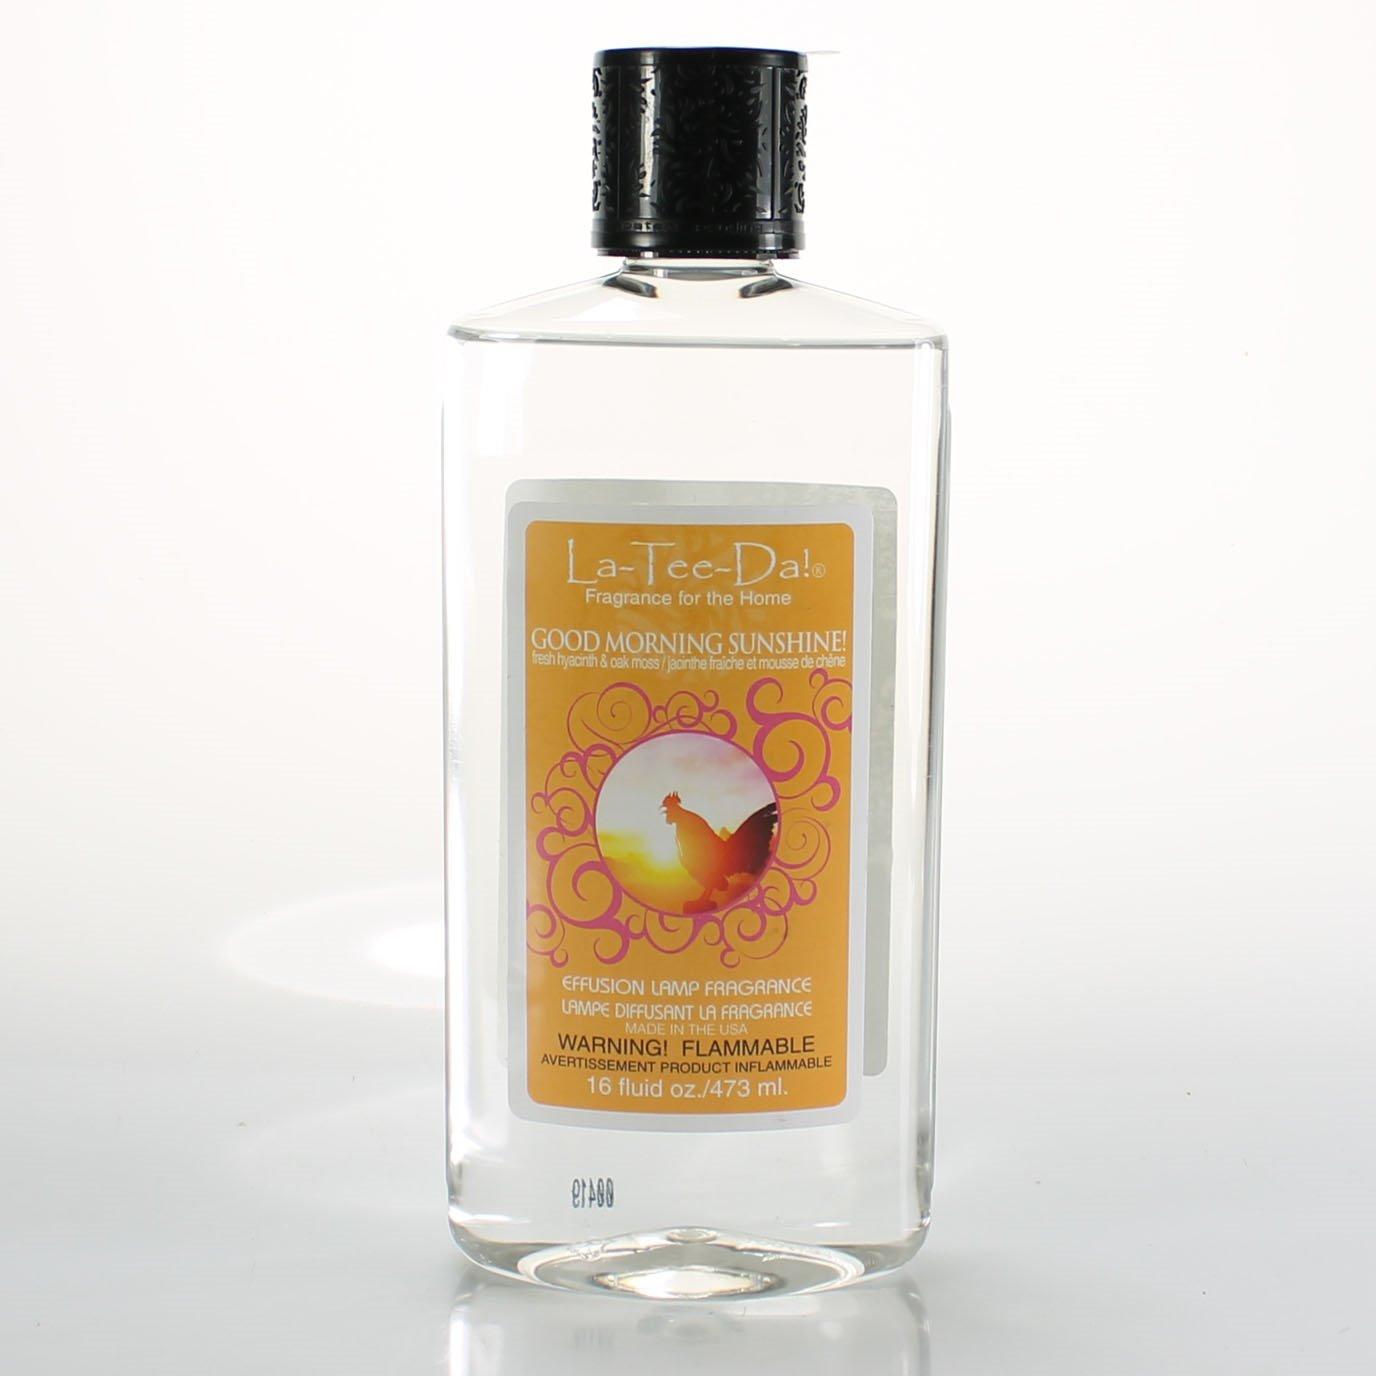 La Tee Da Fuel Fragrance Good Morning Sunshine (16 oz.)